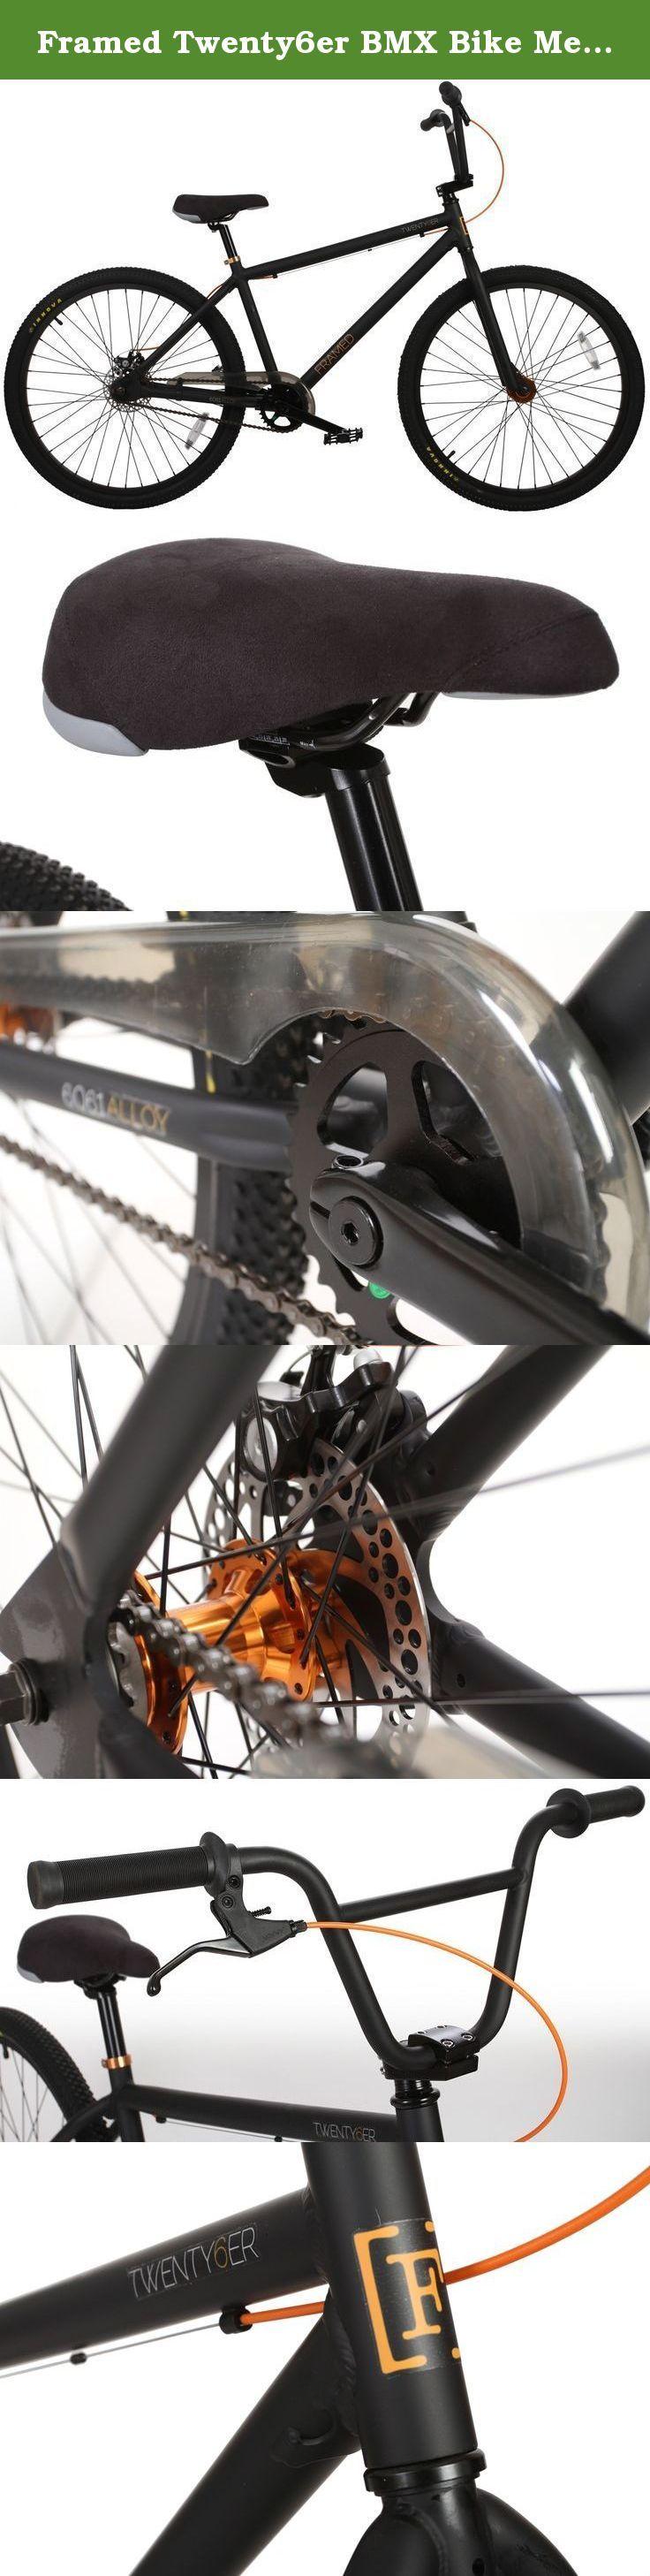 "Framed Twenty6er BMX Bike Mens Sz 26in. Key Features of the Framed Twenty6er BMX Bike: Frame - Ht 41X34X120mm, S/T 31.8mm, T/T 31.8mm, D/T 42mm, Round Tube, S/S 22 C/S 22 Alloy. Top Tube Length - 24.5in. Fork - 29"" Uni-Crown 28.6X25.4X186mm R/30, 0Ld100 31.8Blades W/0 Pivot W/Sw Hole , Leg Is Cr-Mo Cr-Mo. Headsets - 28.6/34/30mm 10Pcs H22.2 W/Alloy Top Cap+Star Nut Non-Hollow Bolt Steel. BB Parts - W/ 5/16""X9Balls Steel. Axle - 8T-19mm Cr-Mo Cold Forged Spline Spindle Cr-Mo. Chainwheel -..."